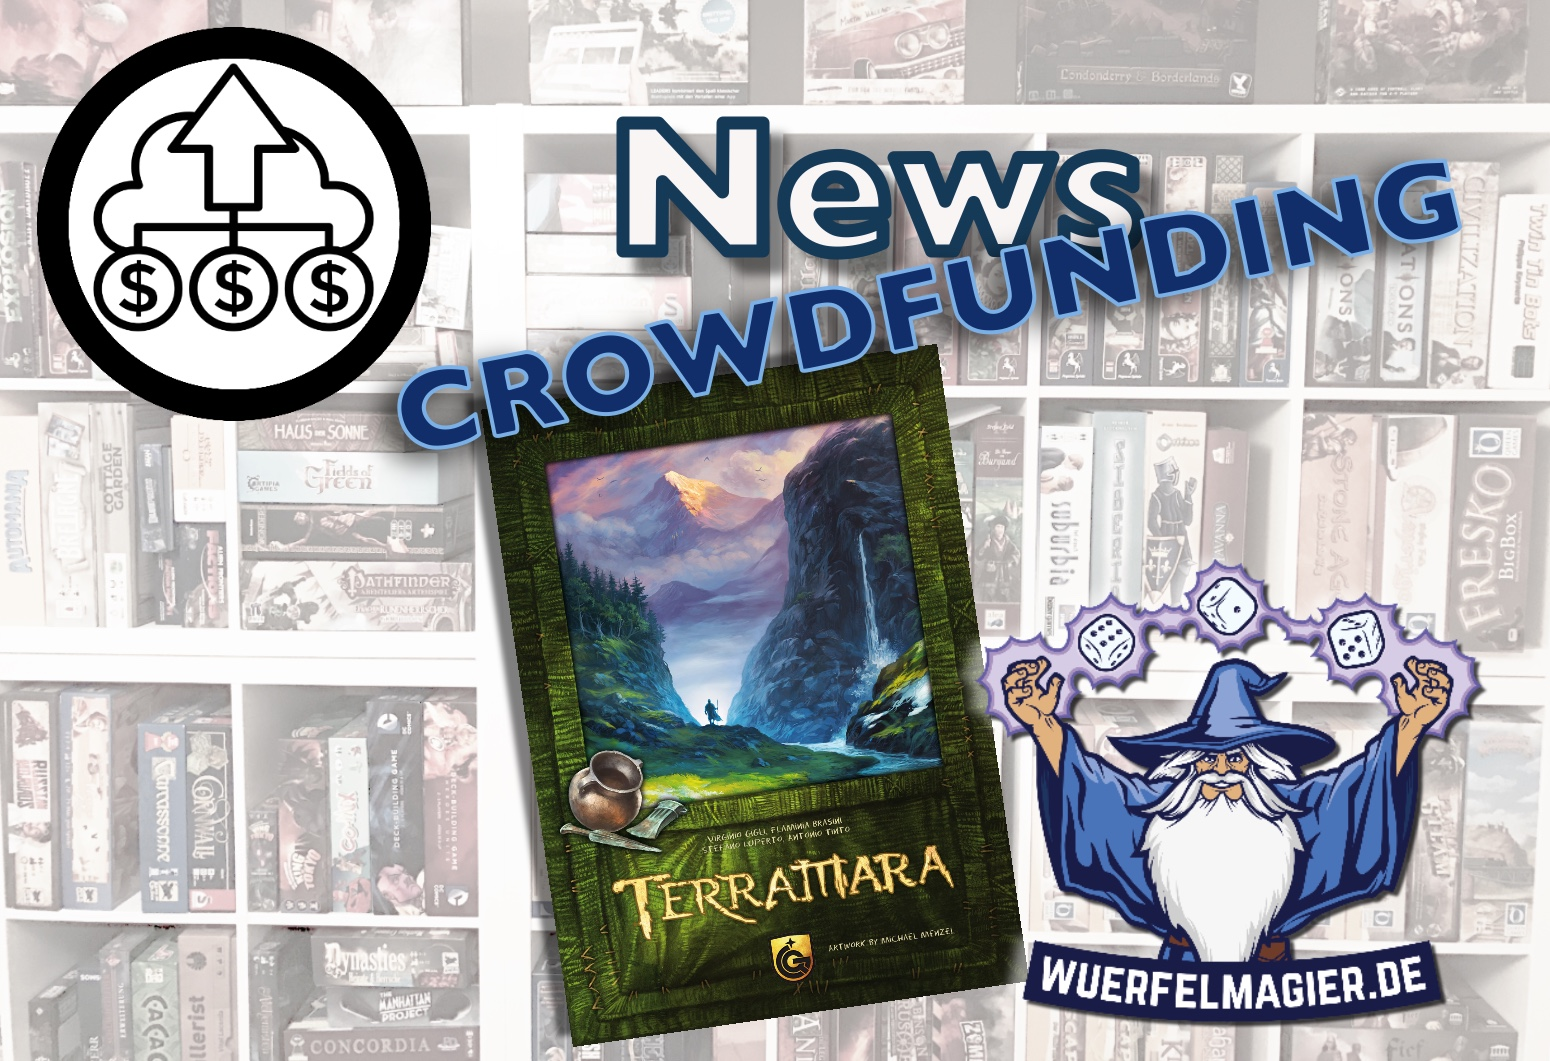 Terramara News Crowdfunding Quined Games Wuerfelmagier Würfelmagier